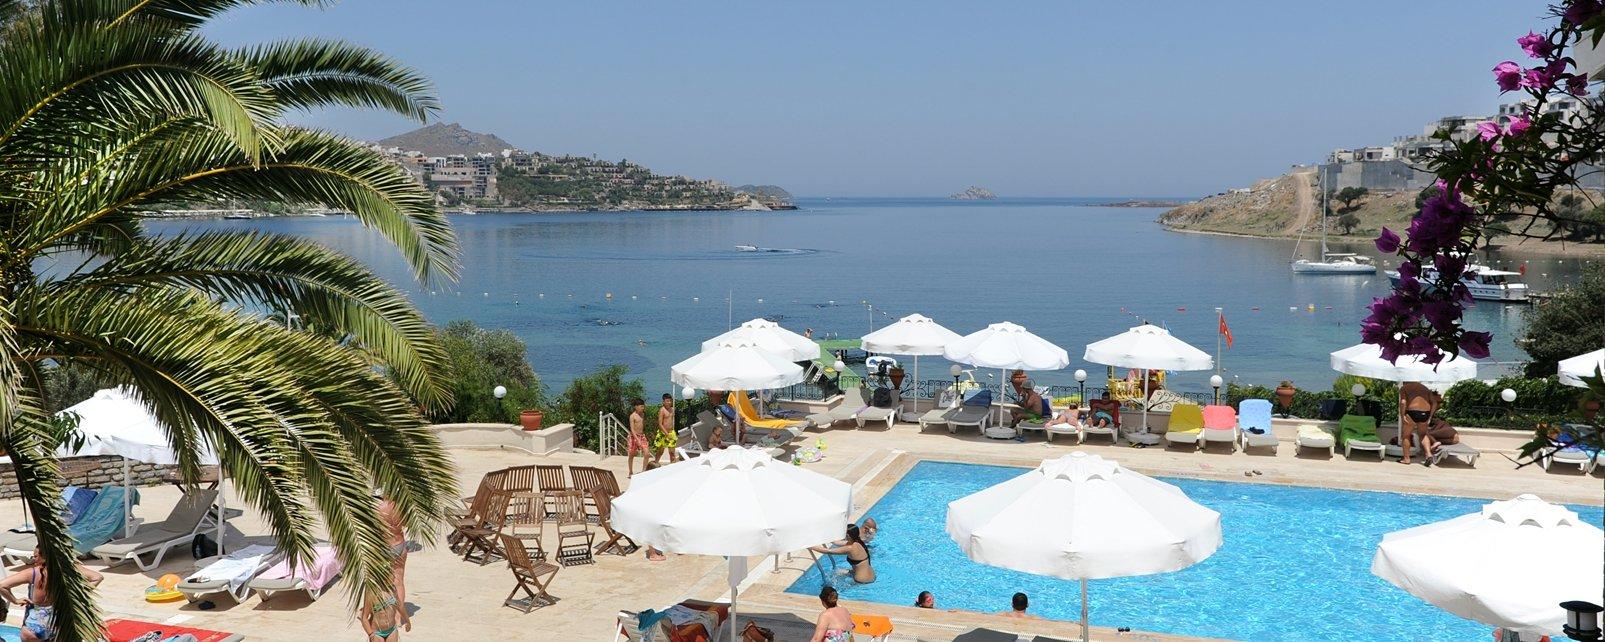 Club Marmara Mirage